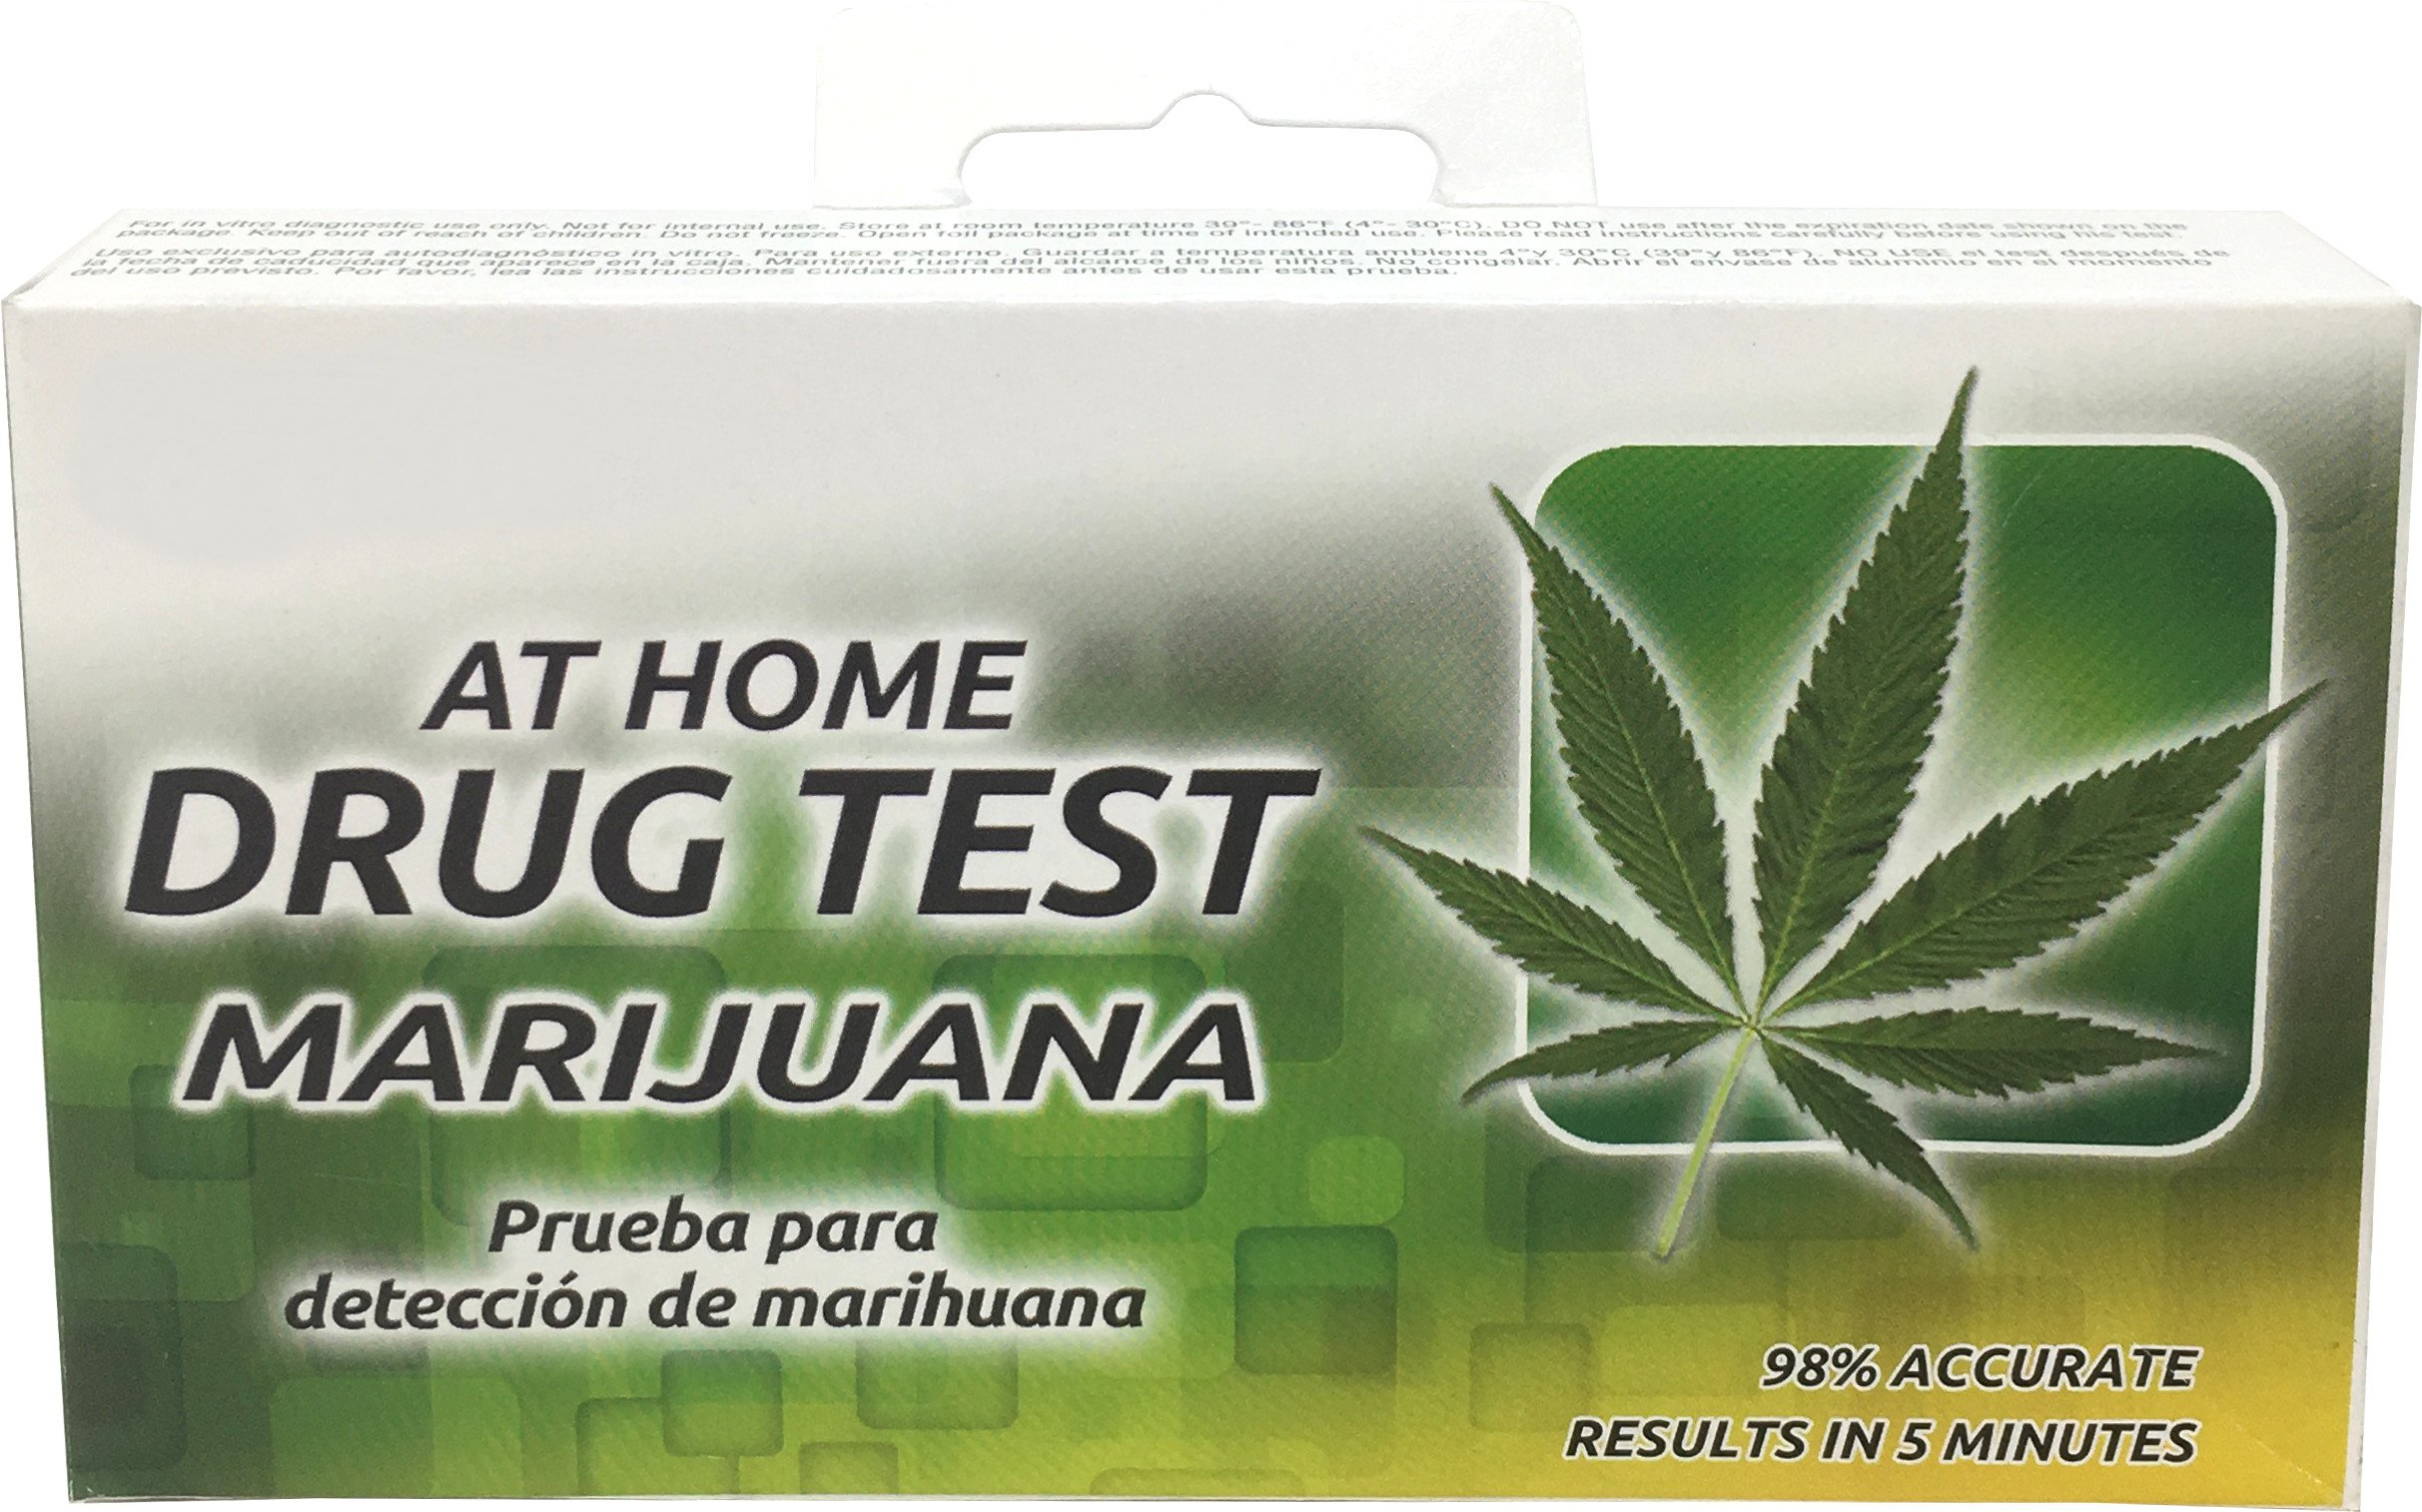 #1 Best Selling Marijuana Easy at Home Drug Single Strip with Multiple Packs (16)